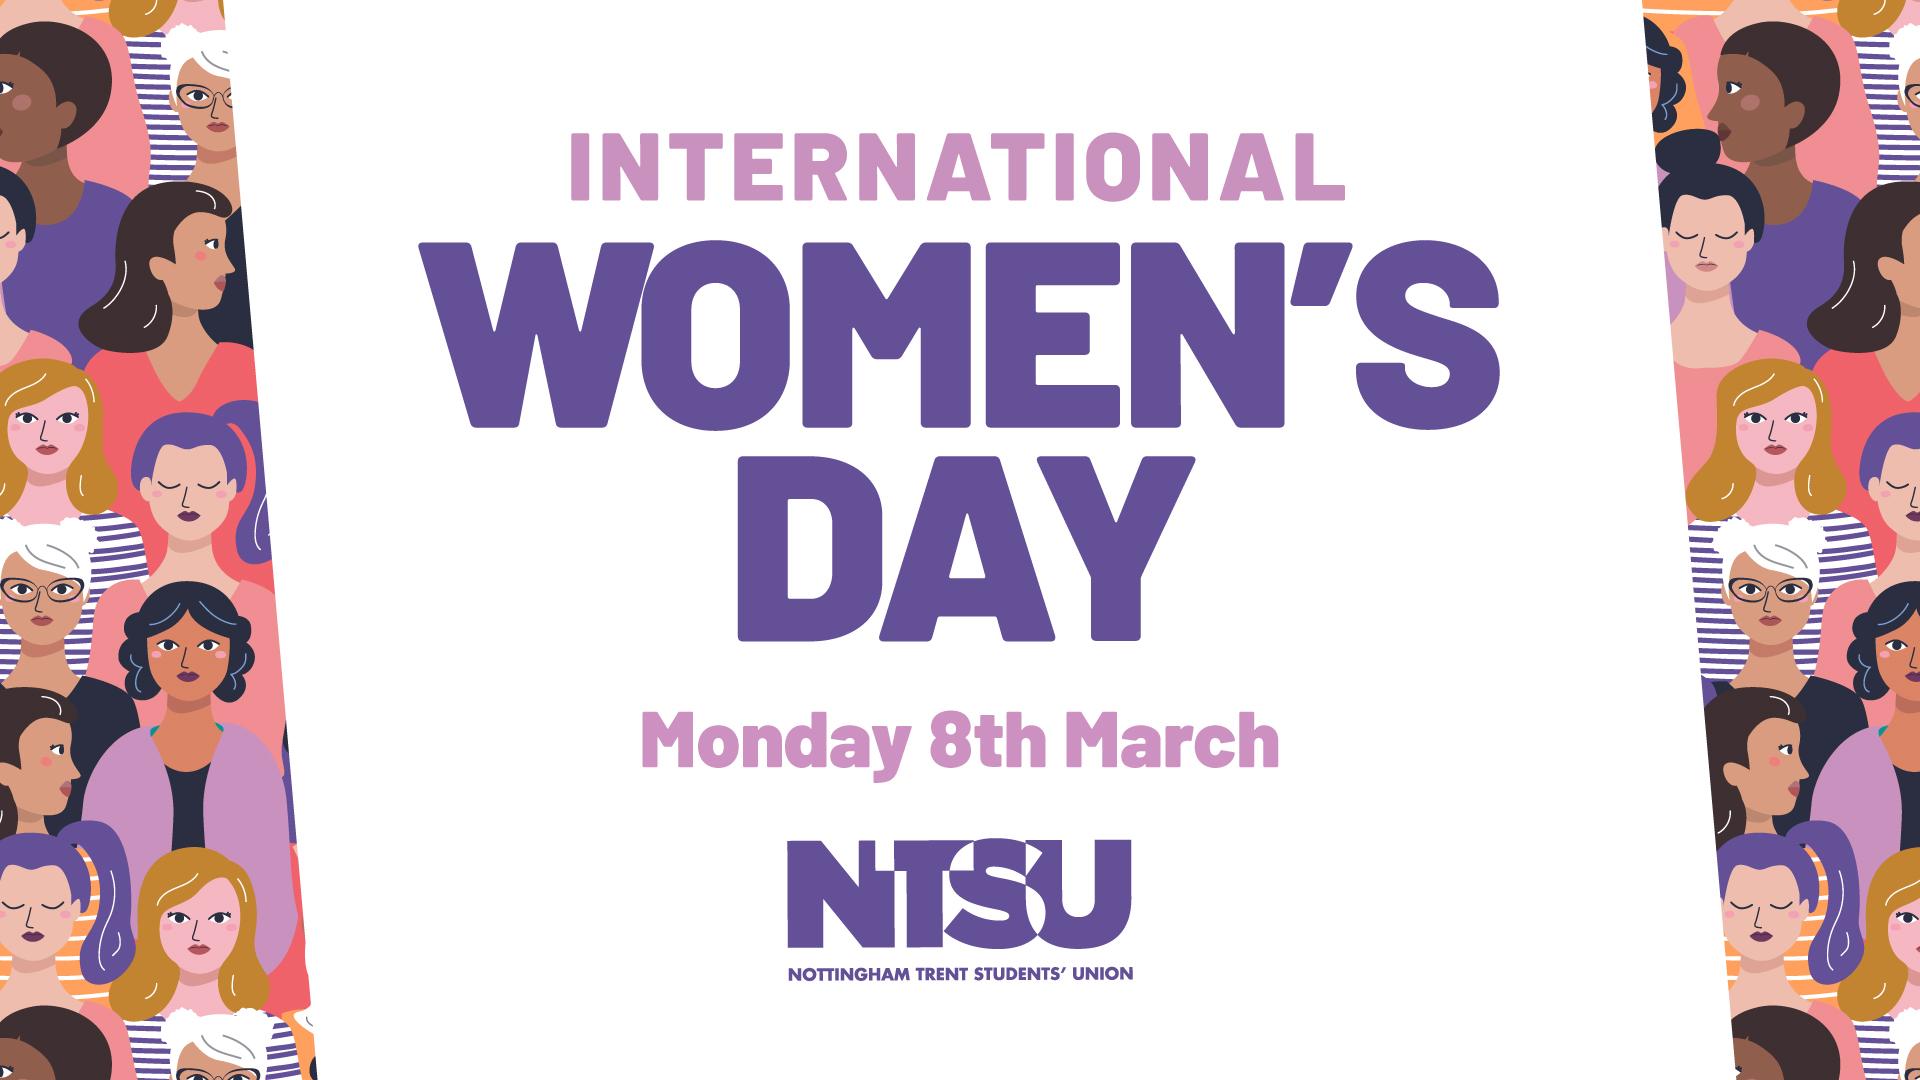 International Women's Day Monday 8th March. NTSU Nottingham Trent Students Union